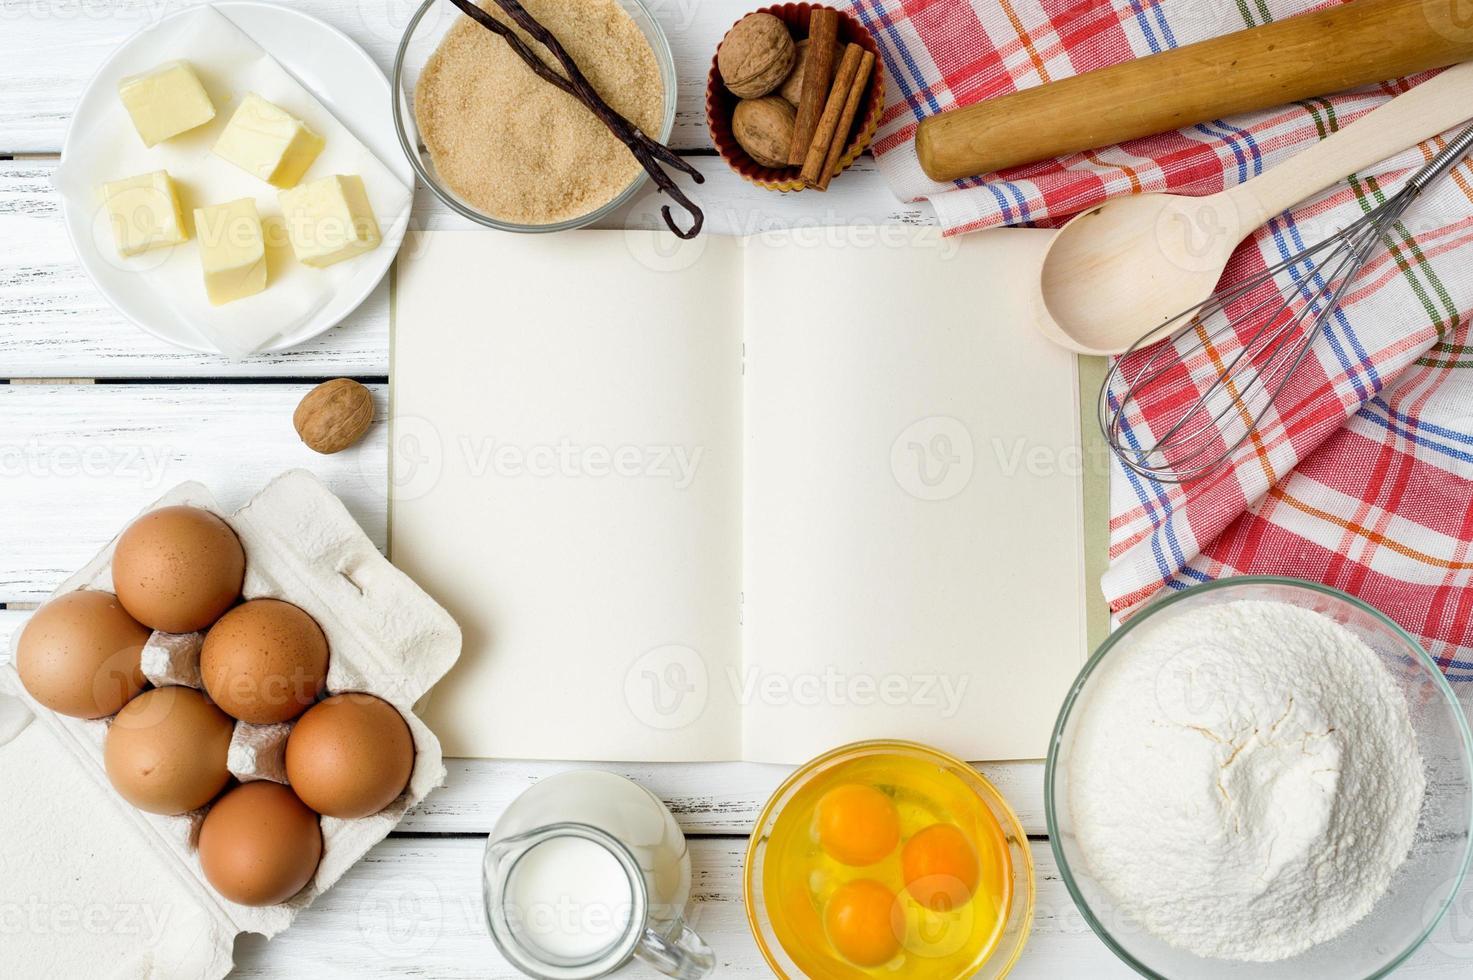 receptenboek achtergrond foto